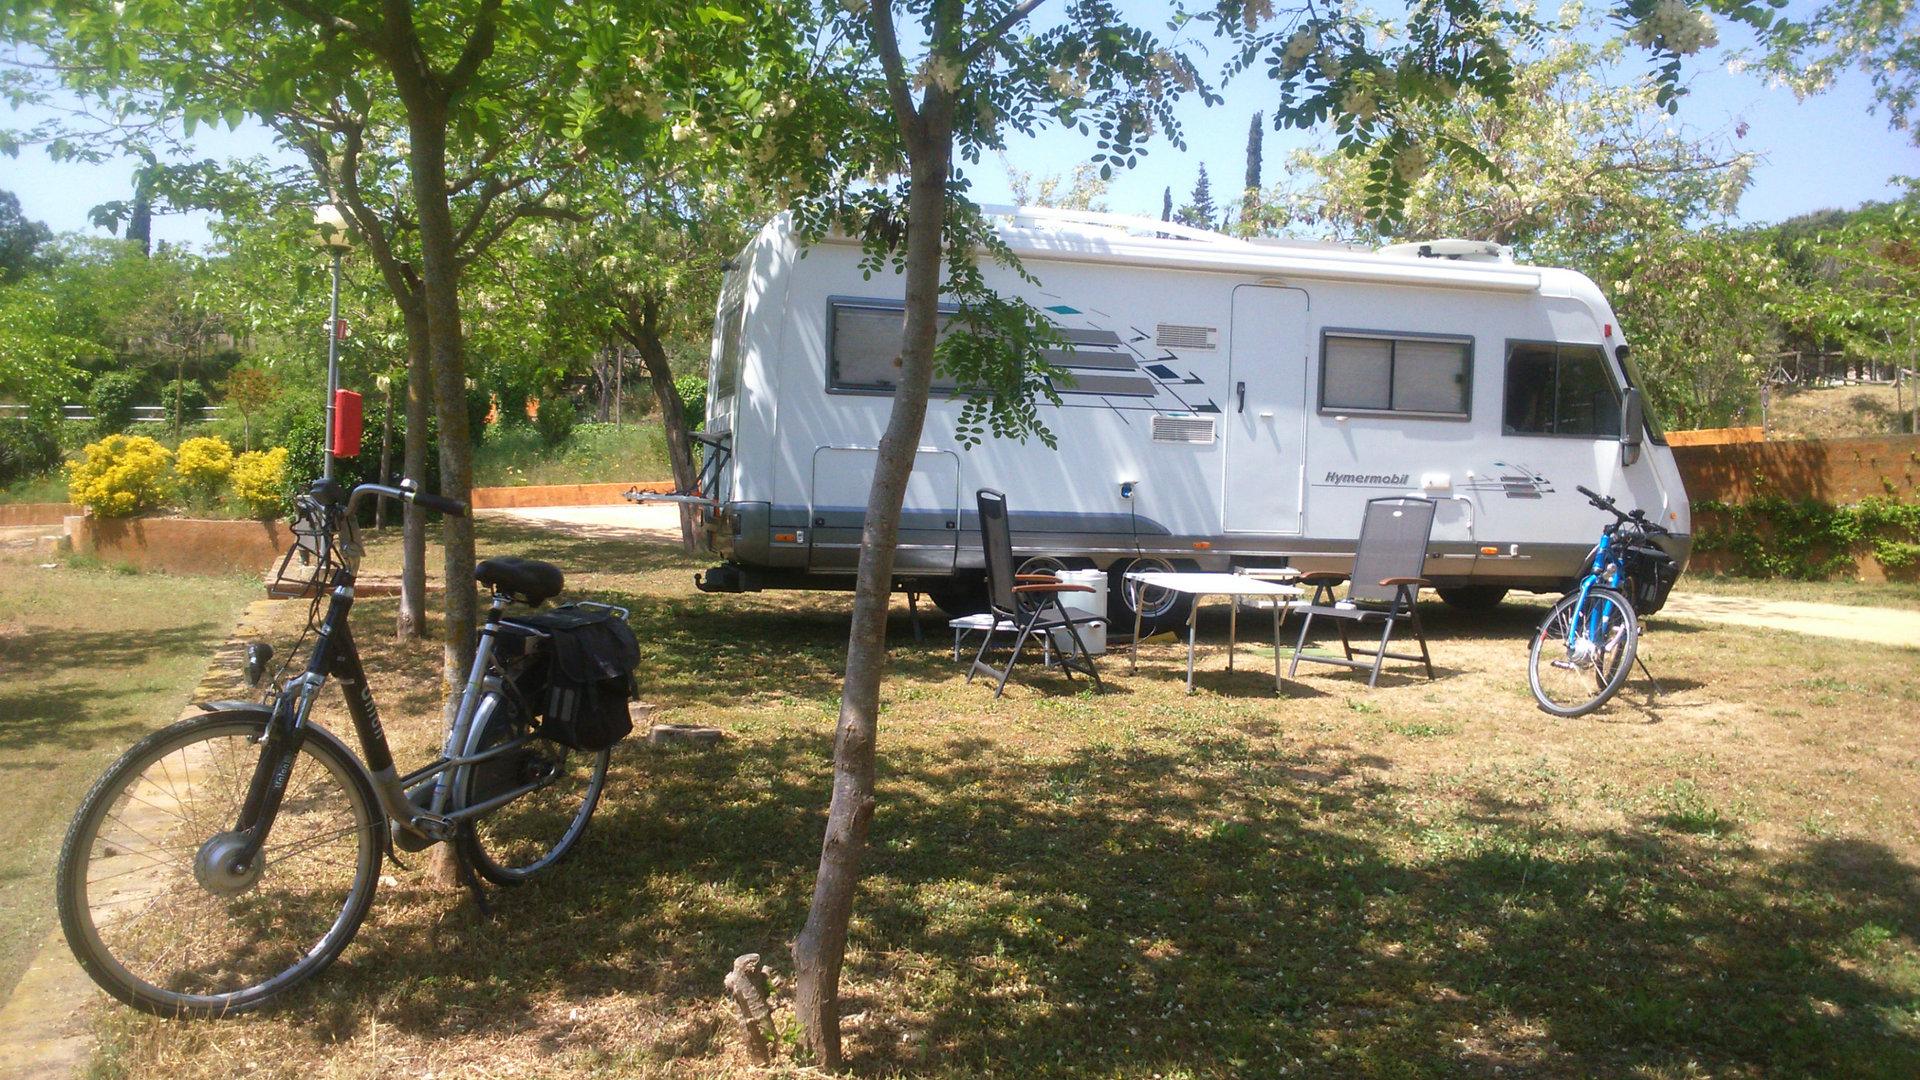 Spanje-Lloret%20de%20Mar-Camping%20Lloret%20Blau-ExtraLarge Campings Spanje